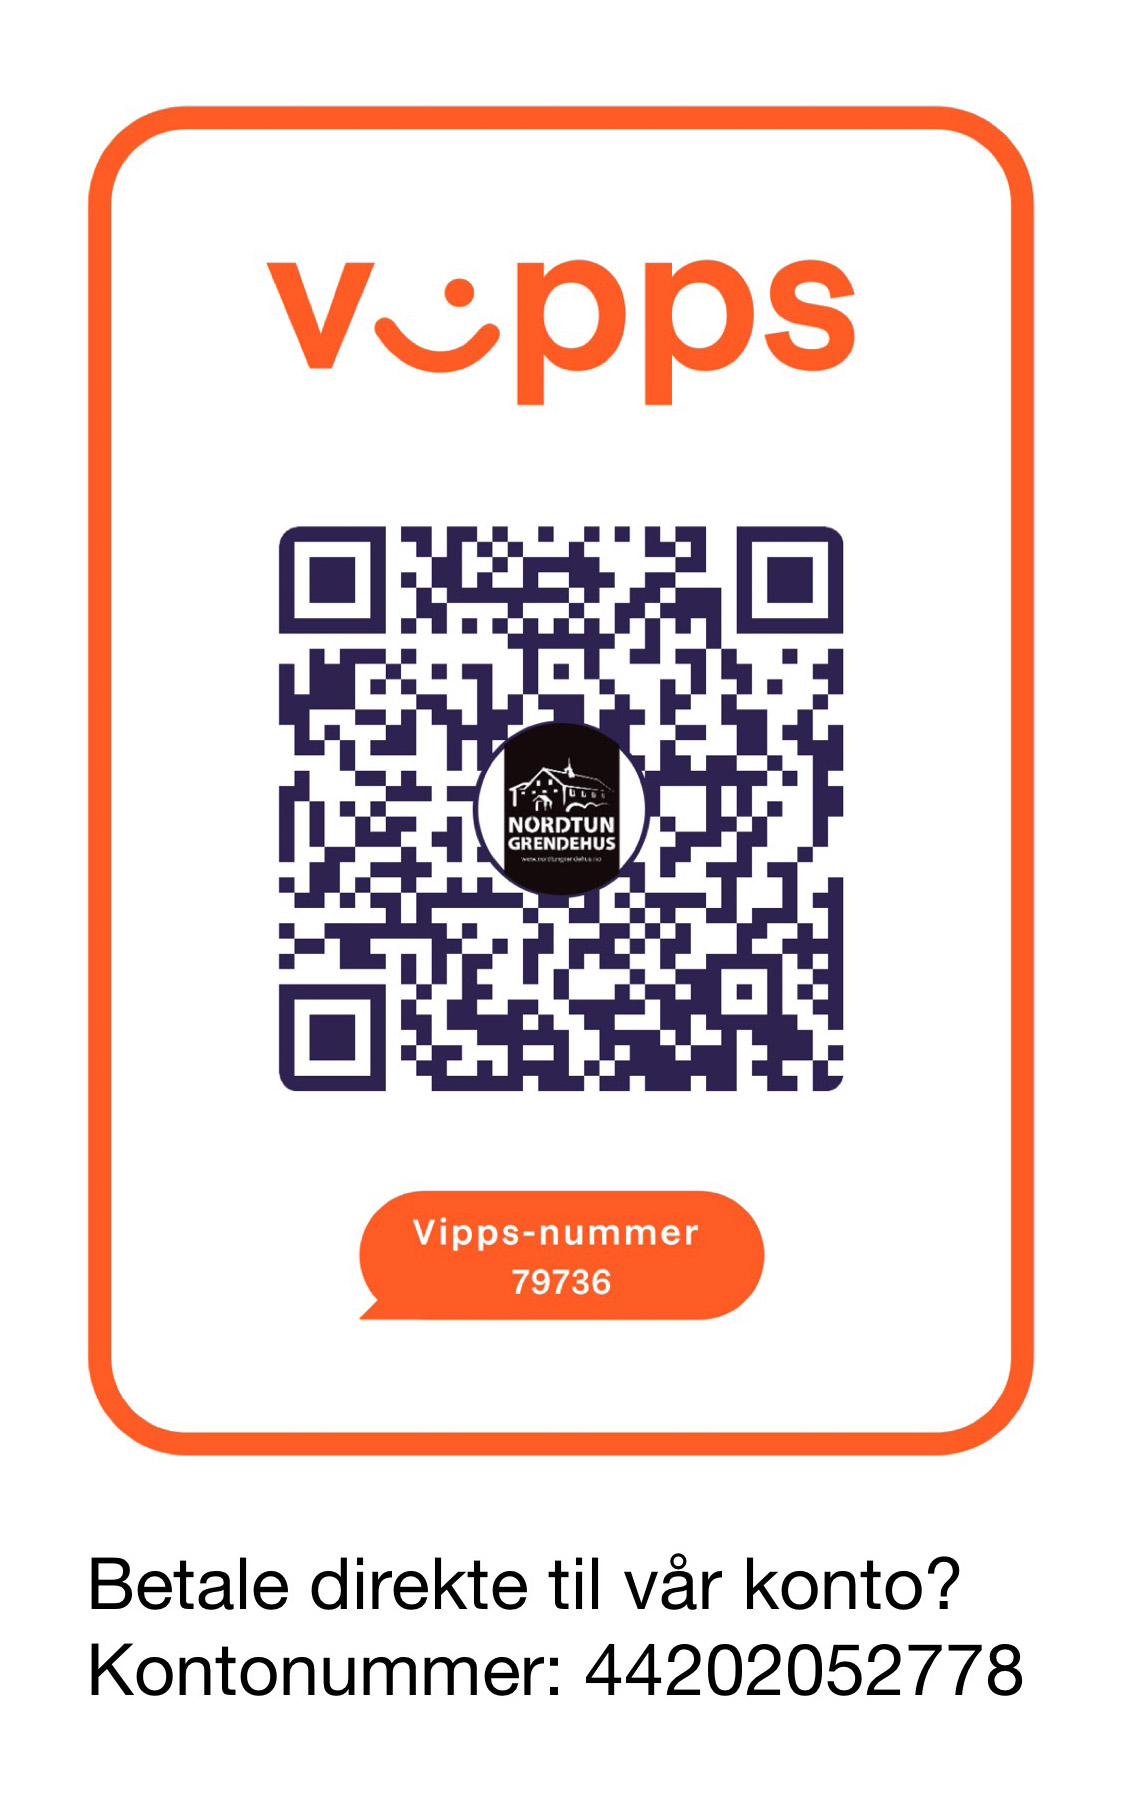 Vipps-info